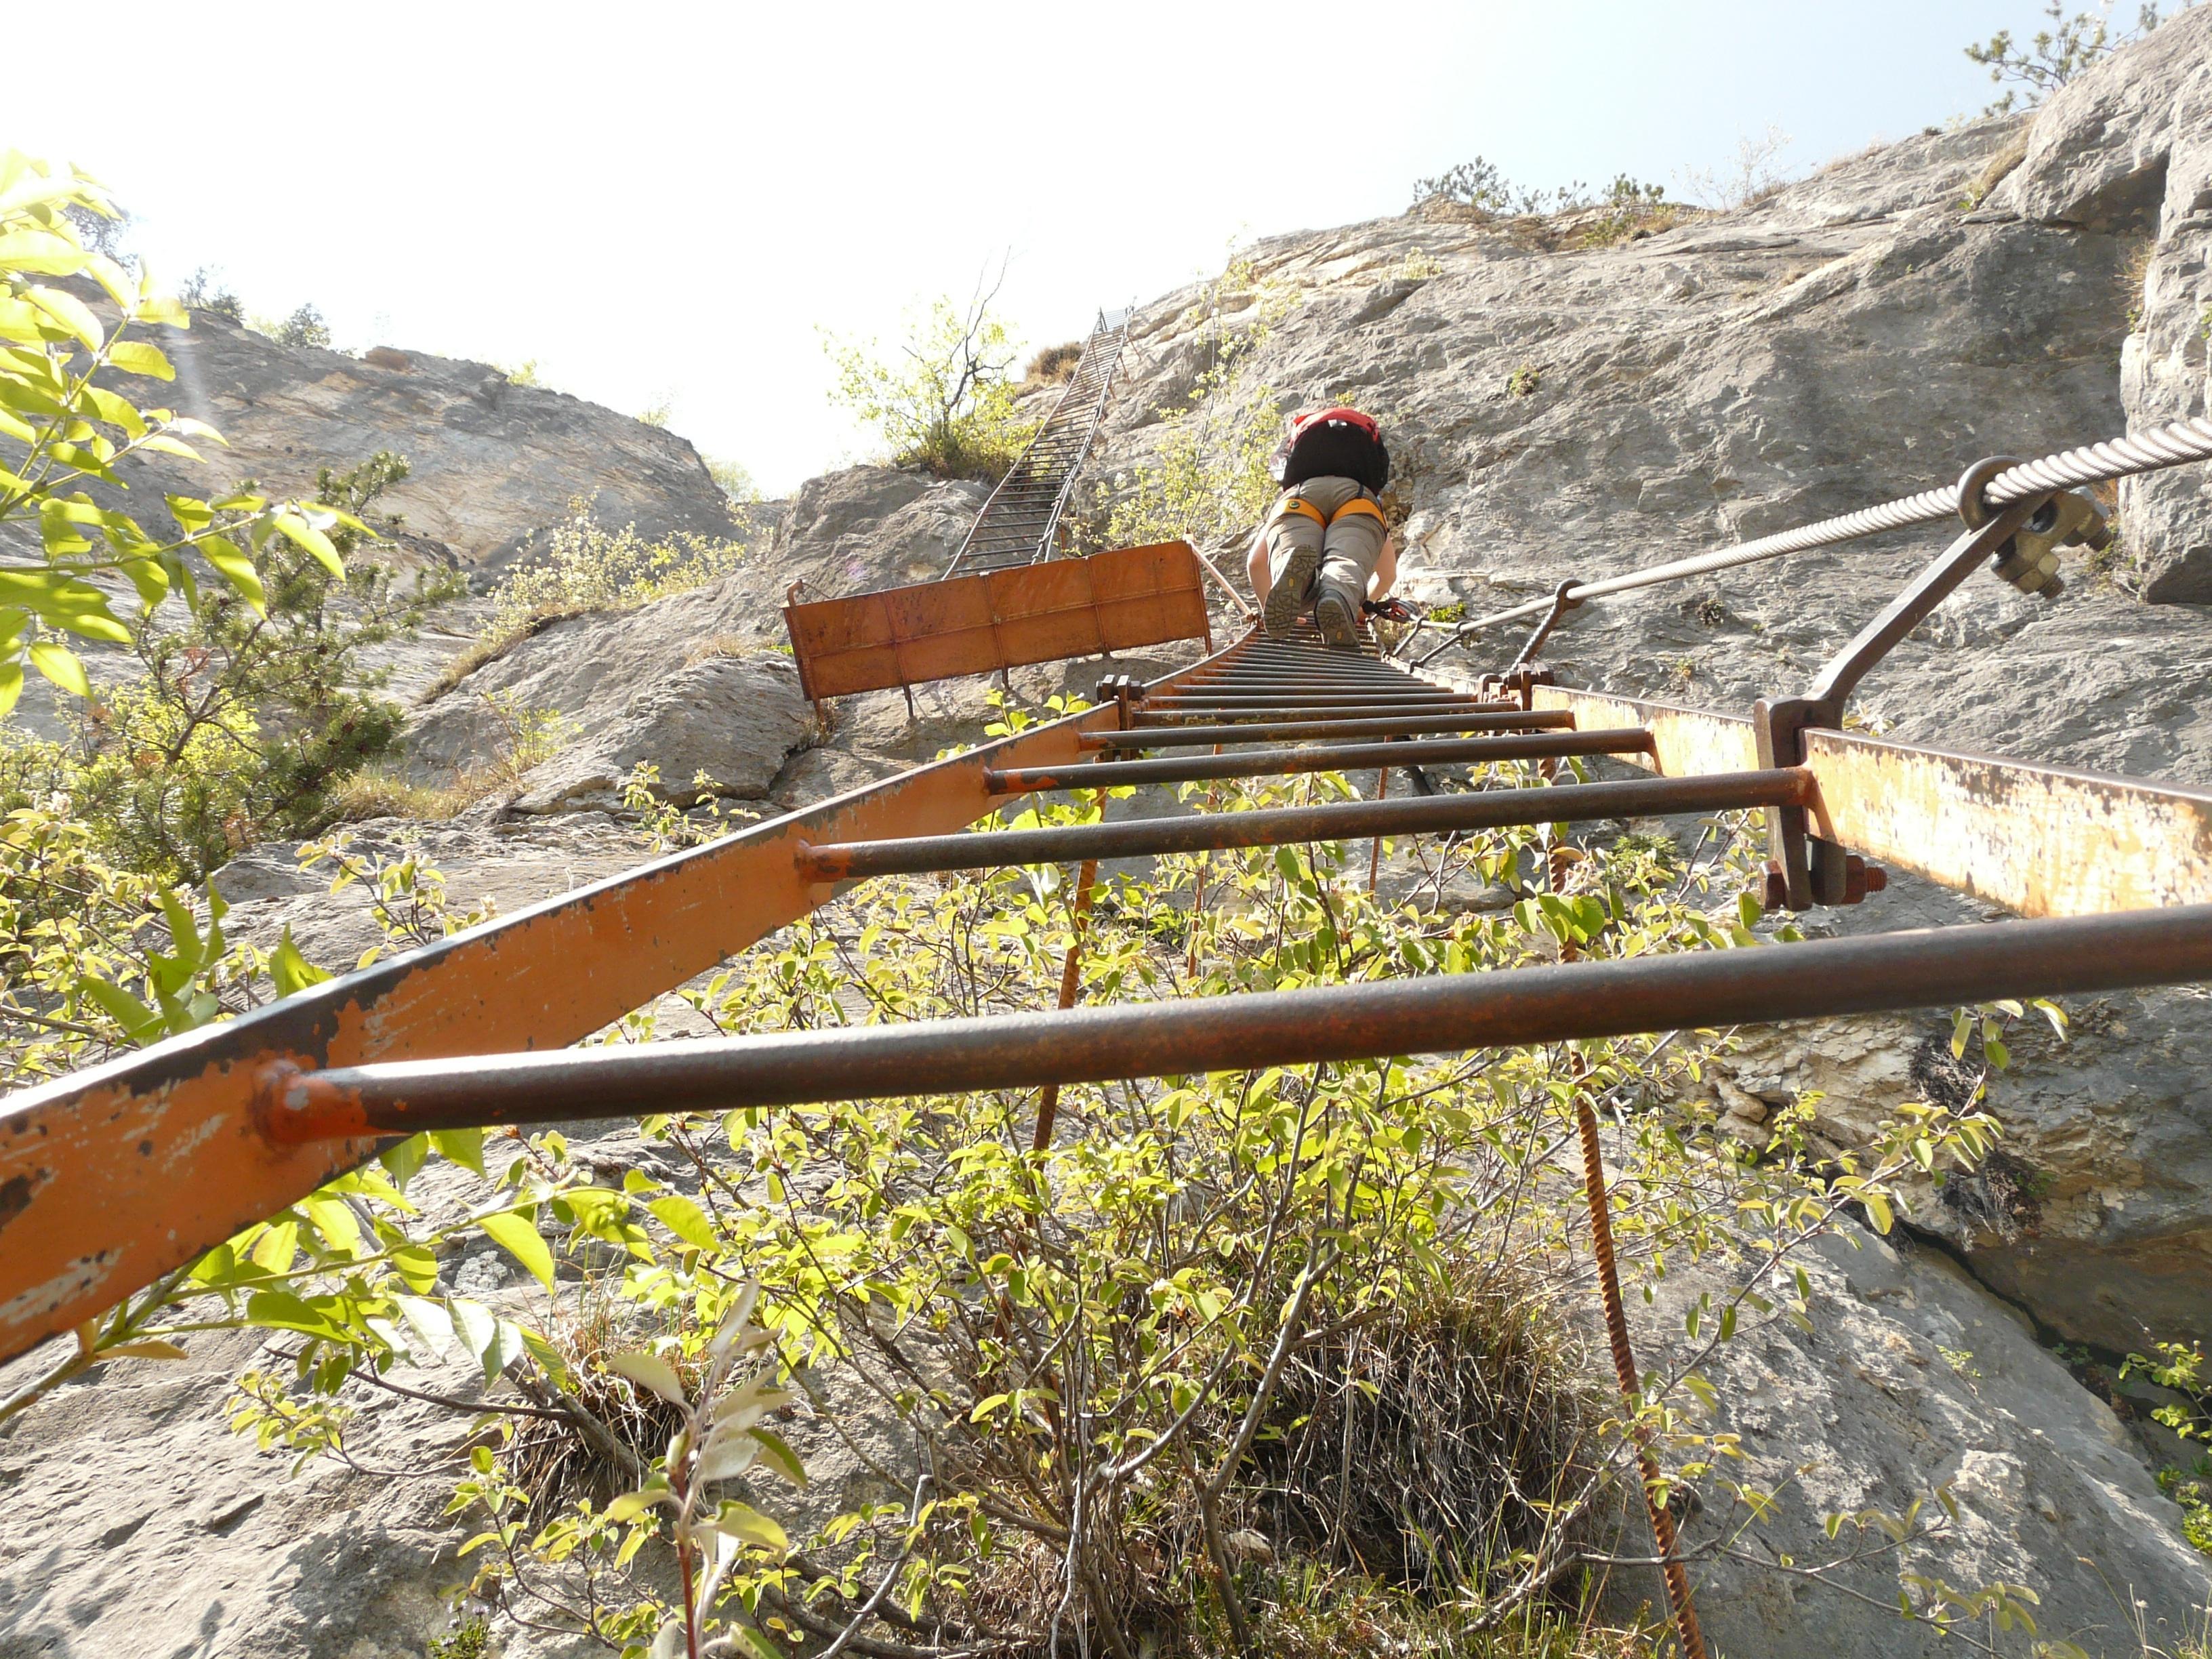 Klettergurt Alpin : Kostenlose foto : rock spur wandern eng fahrzeug wanderung